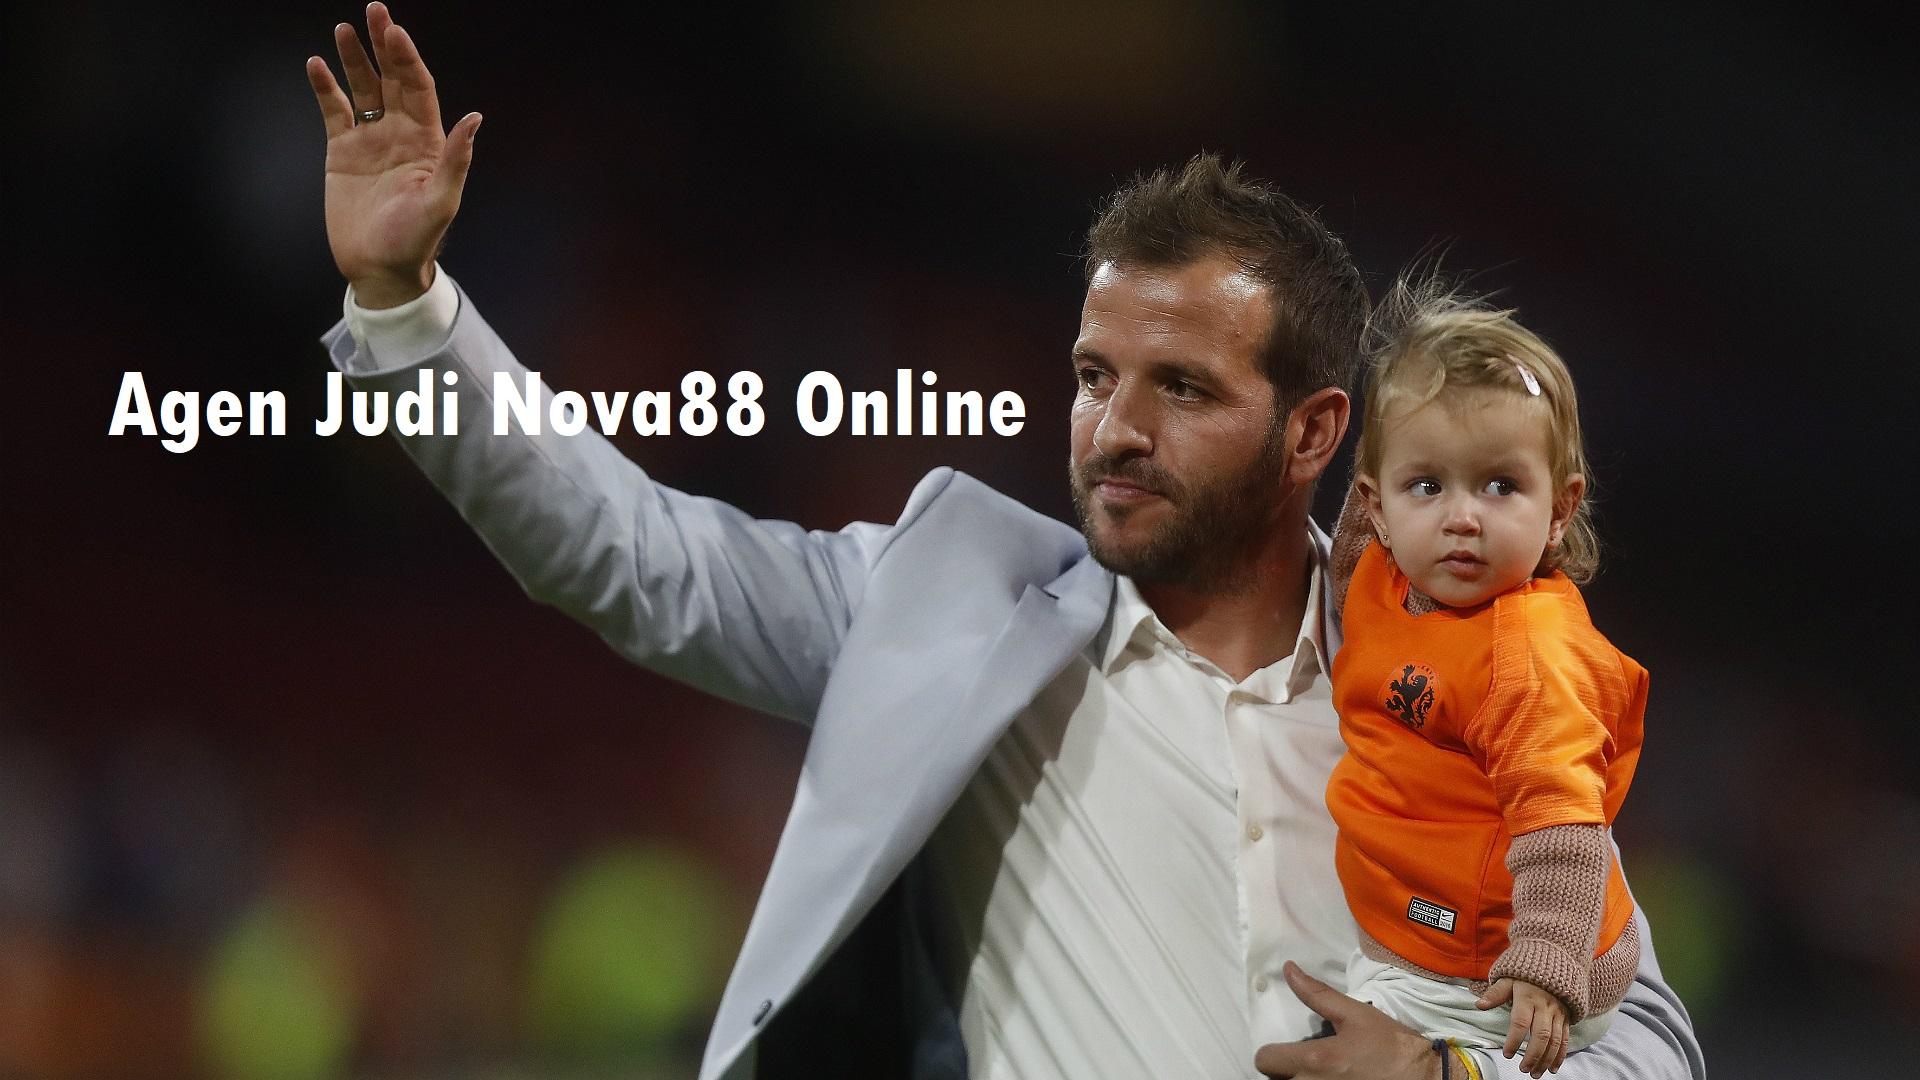 Agen Judi Nova88 Online Terpercaya